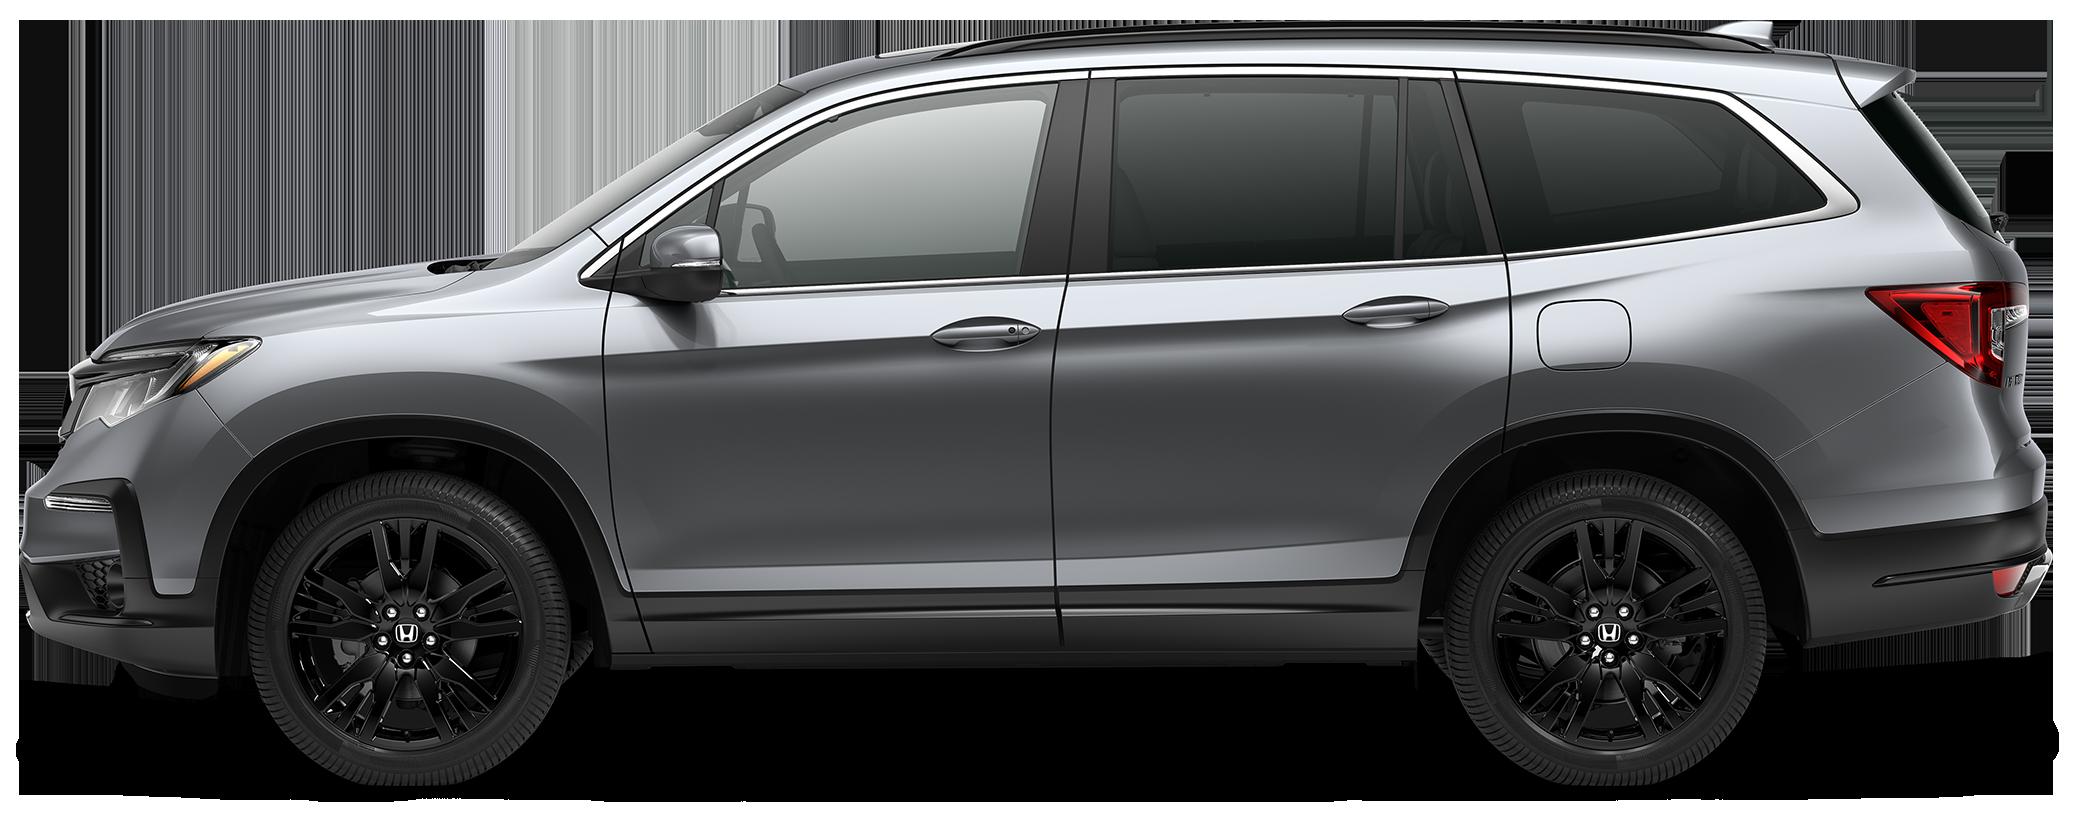 2022 Honda Pilot SUV Special Edition